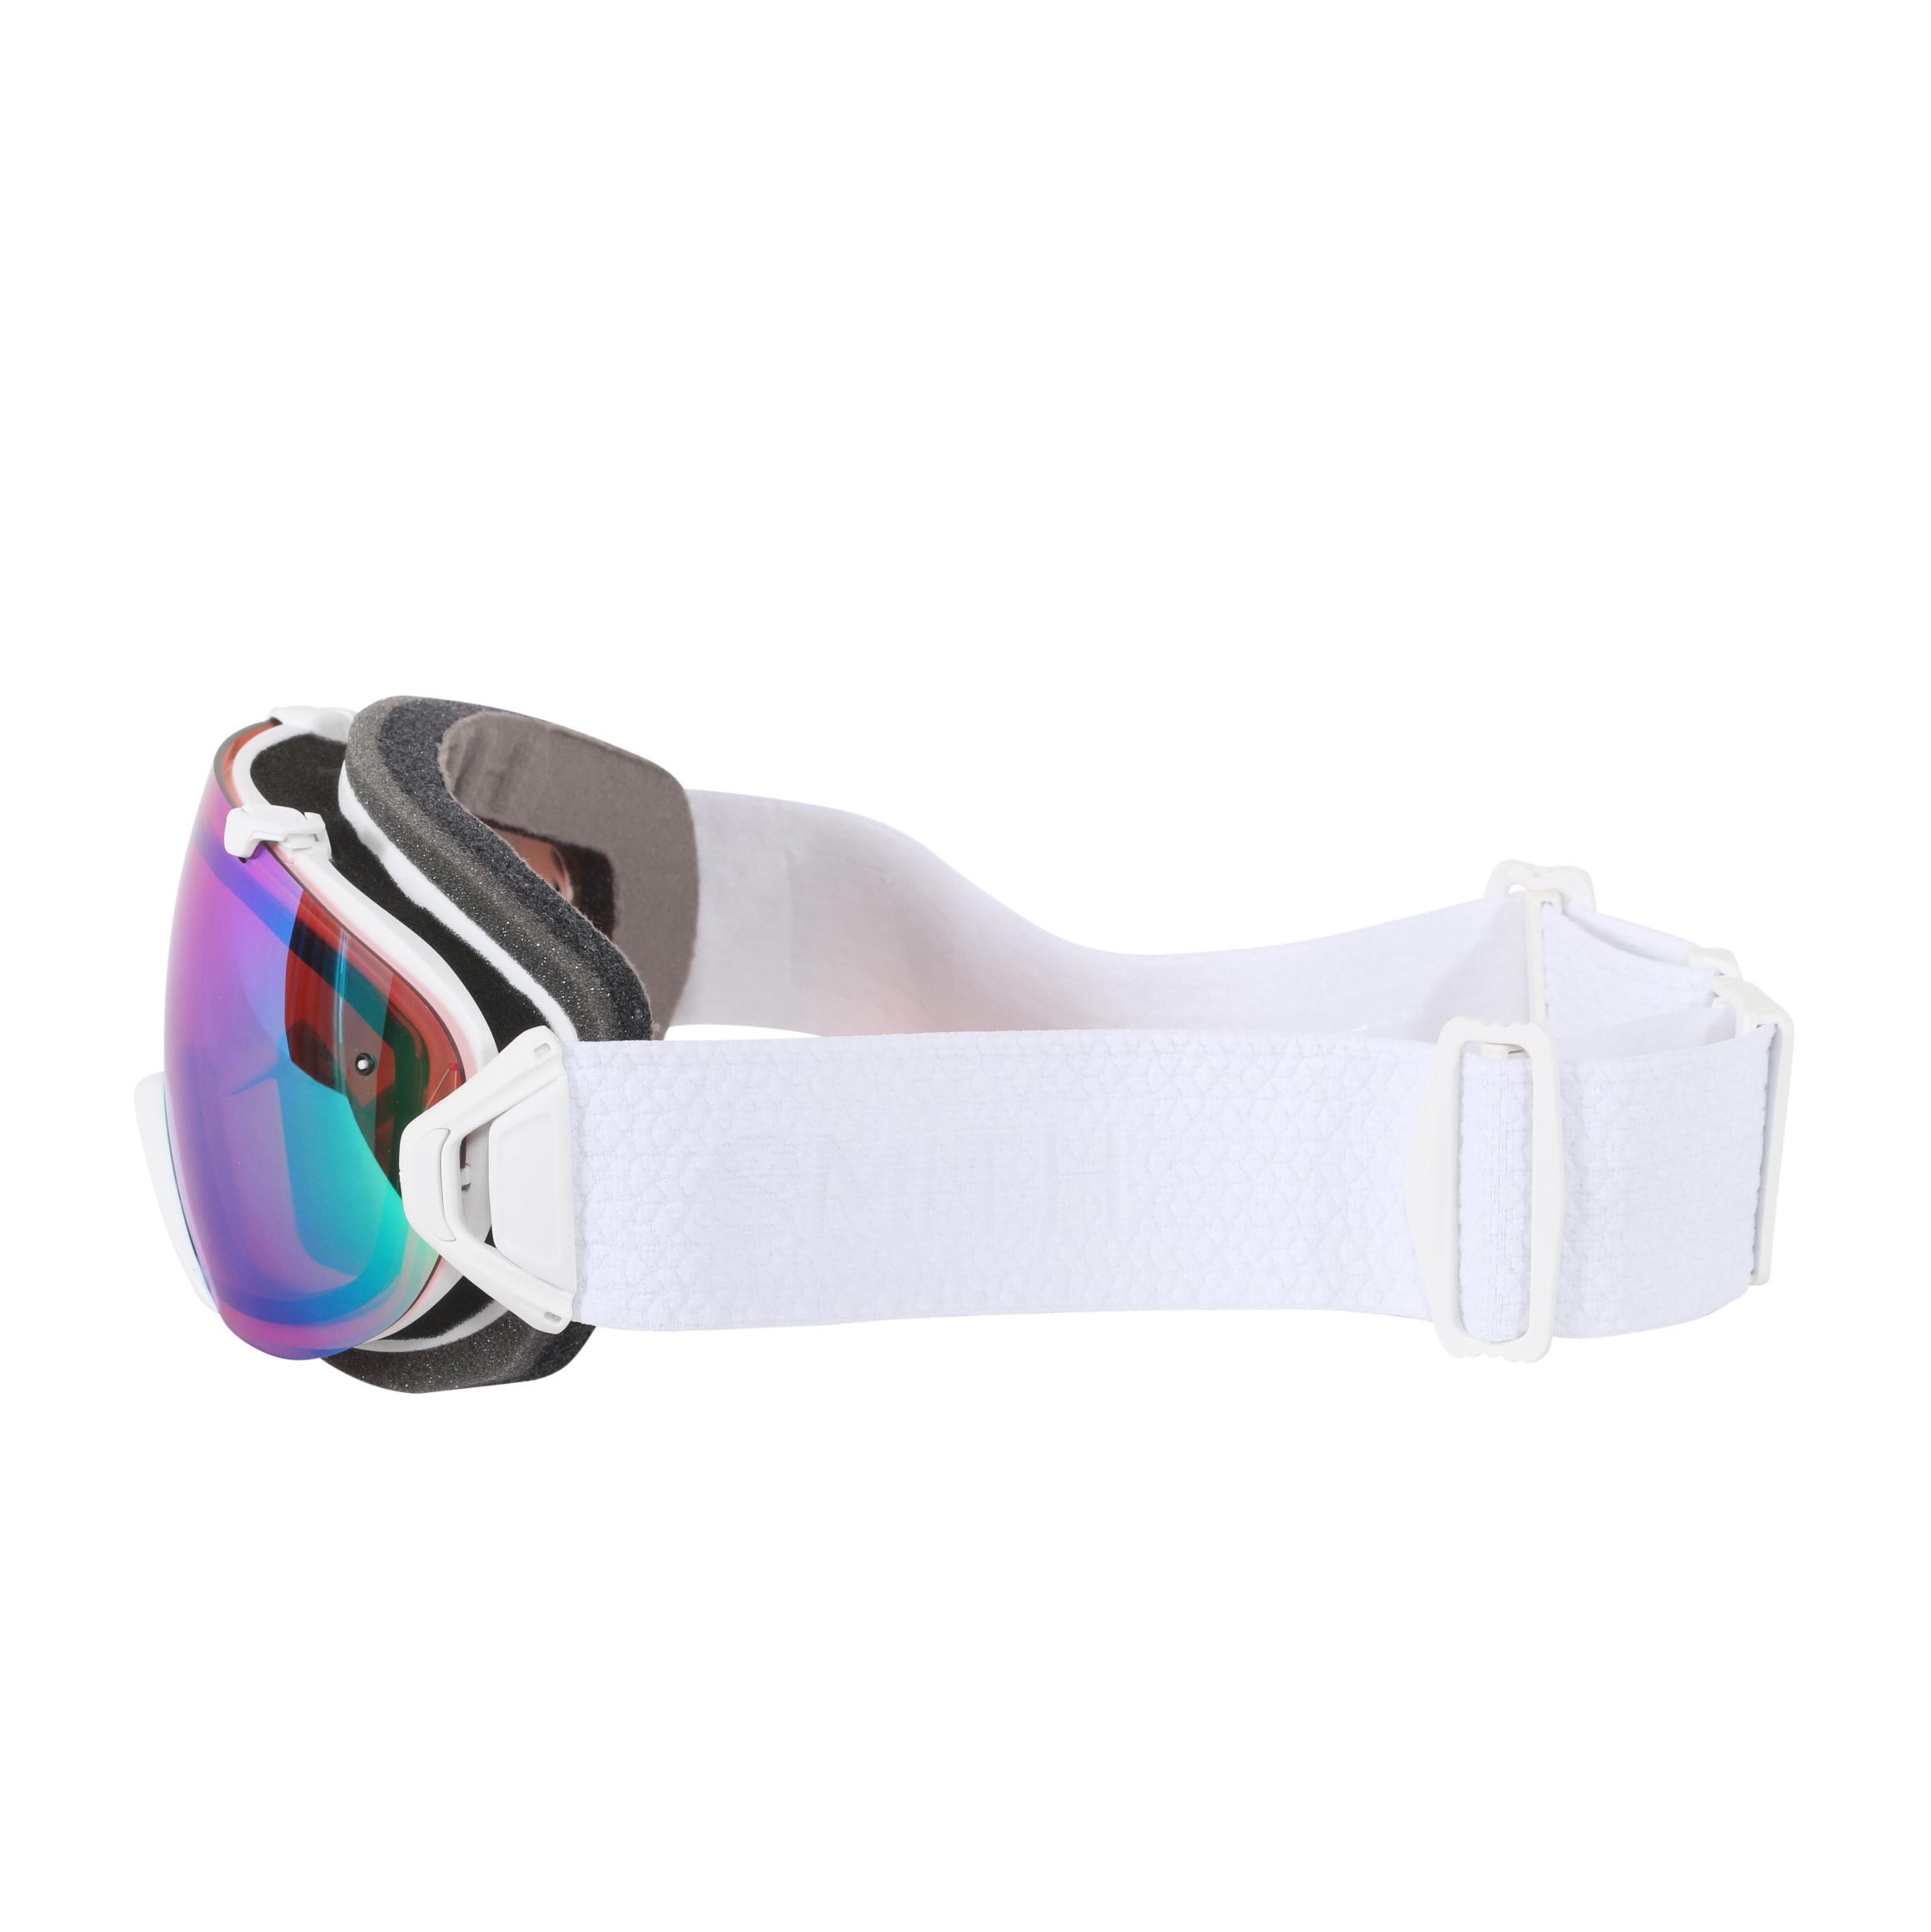 a5163784a9915 Smith Optics White Mosaic ChromaPop Everyday I OS Interchangeable Snow  Goggles - Walmart.com